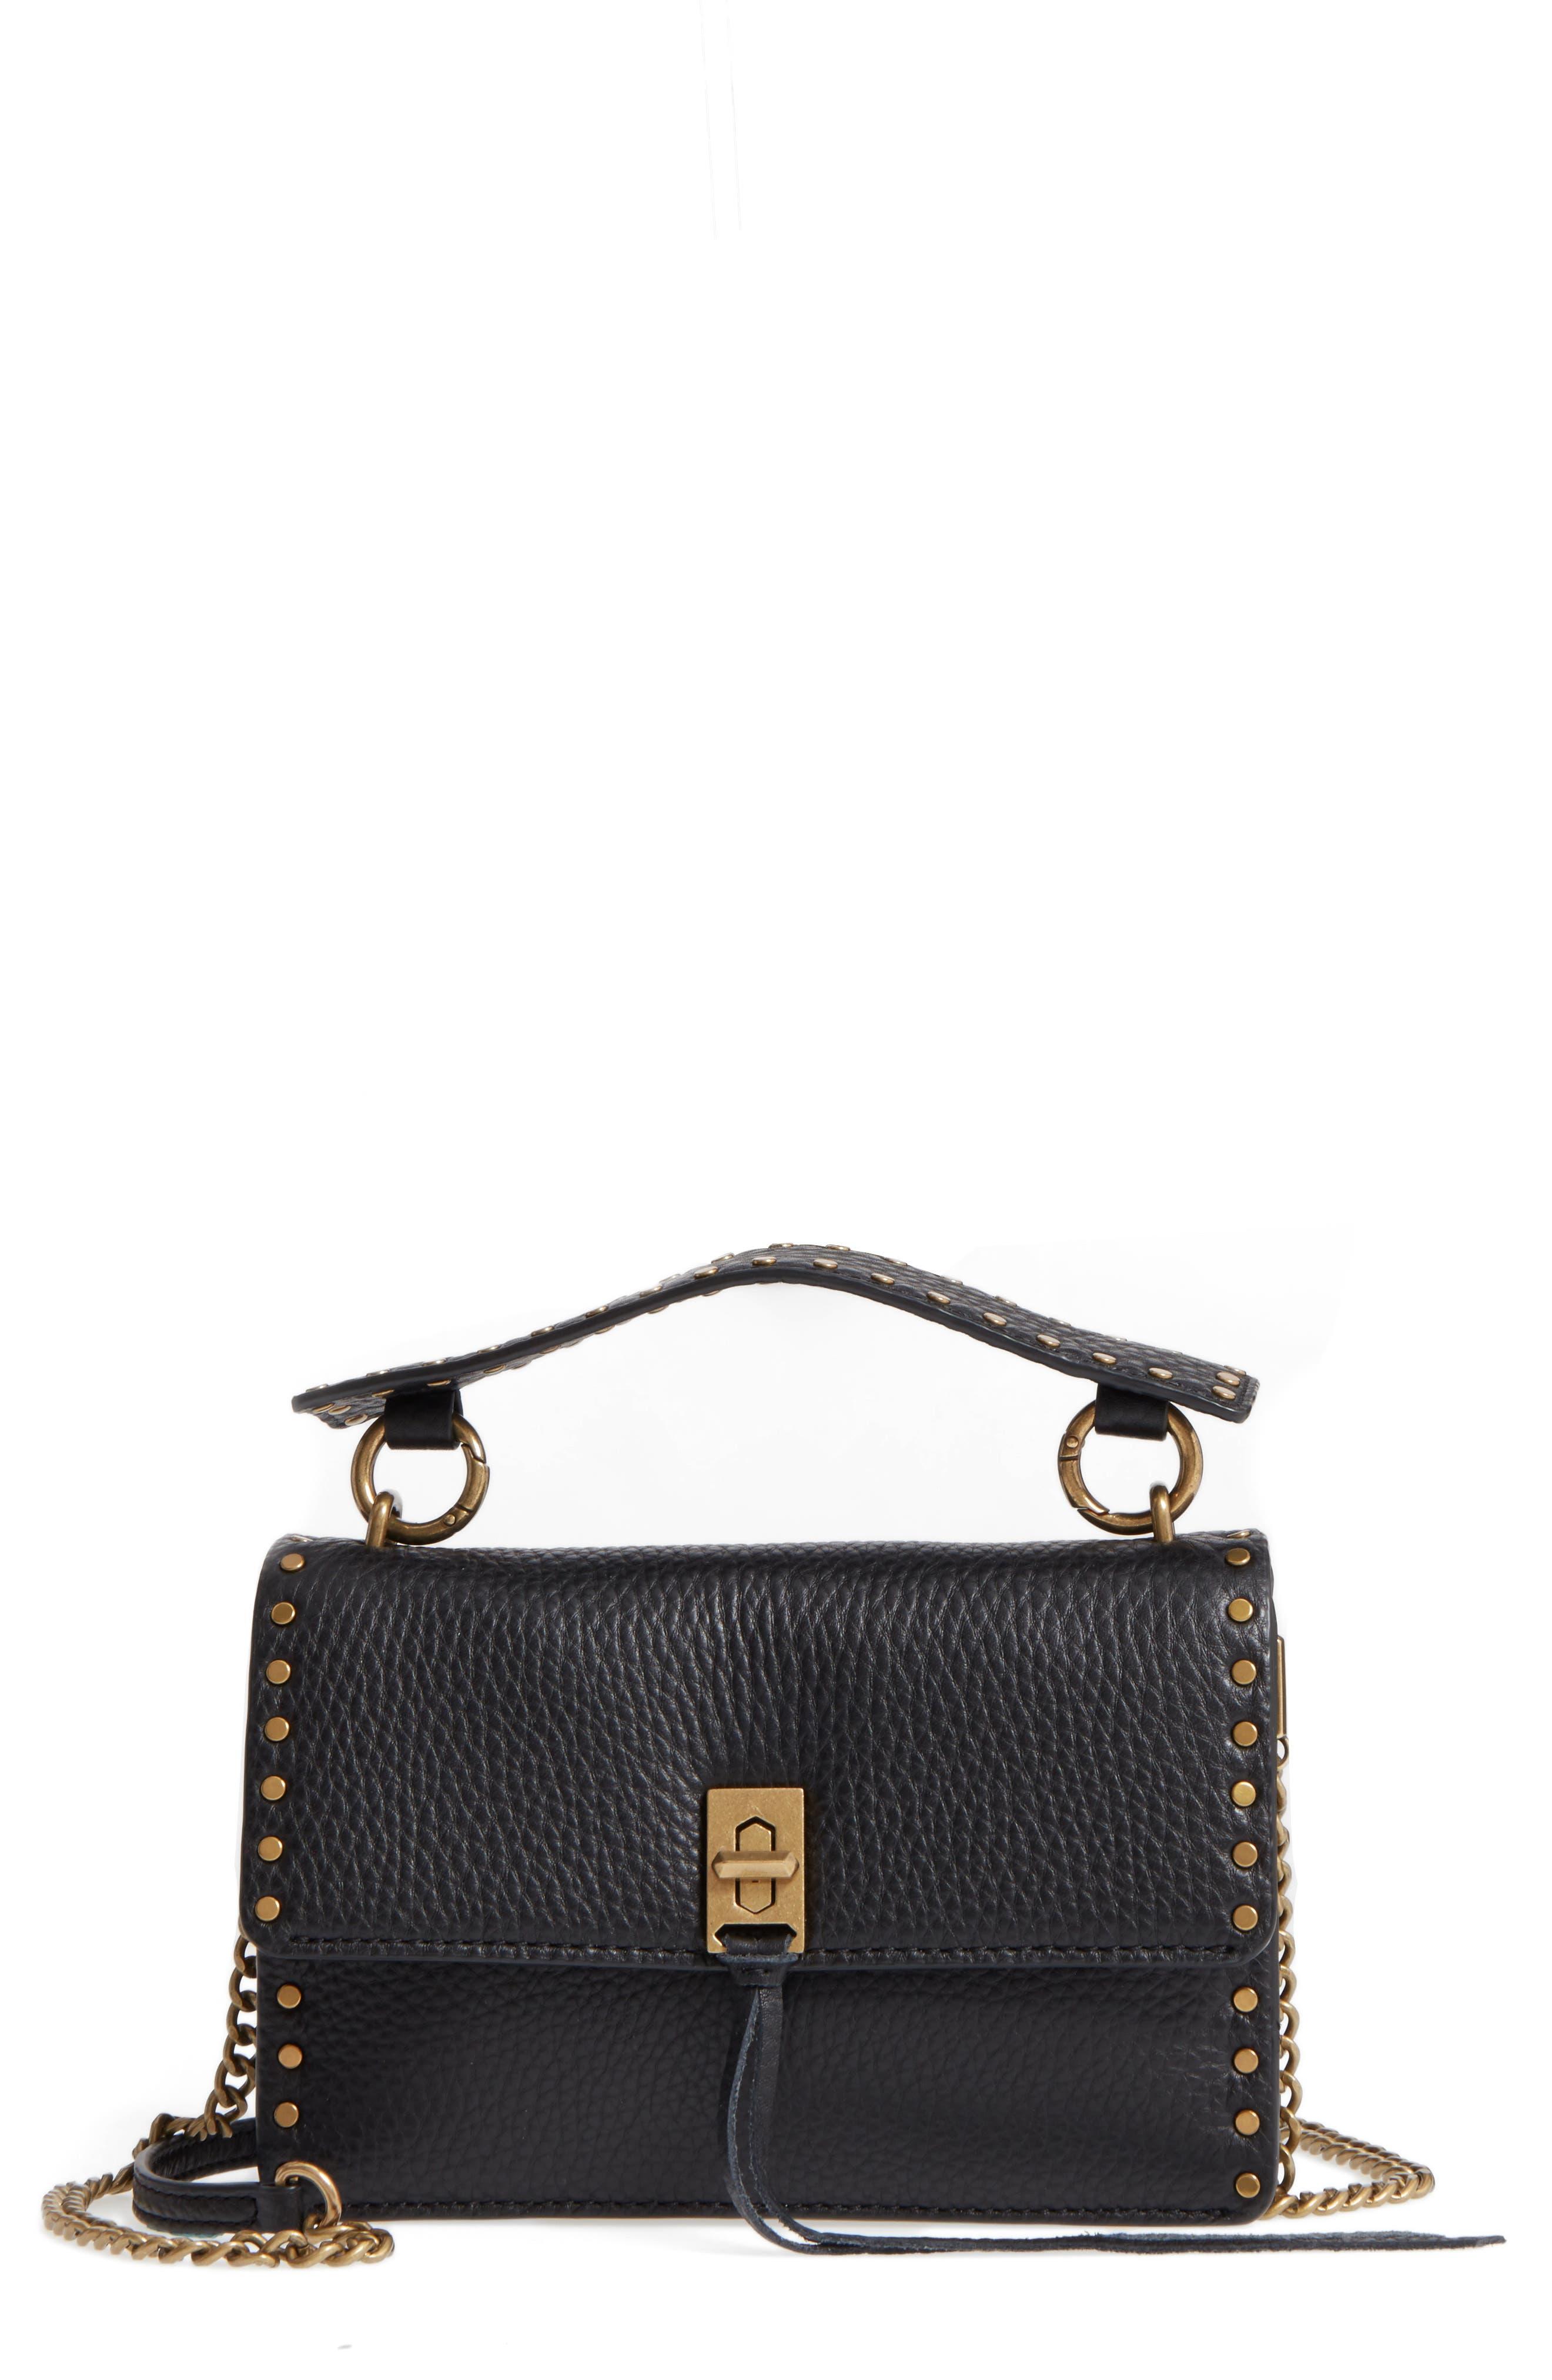 Rebecca Minkoff Darren Top Handle Crossbody Bag